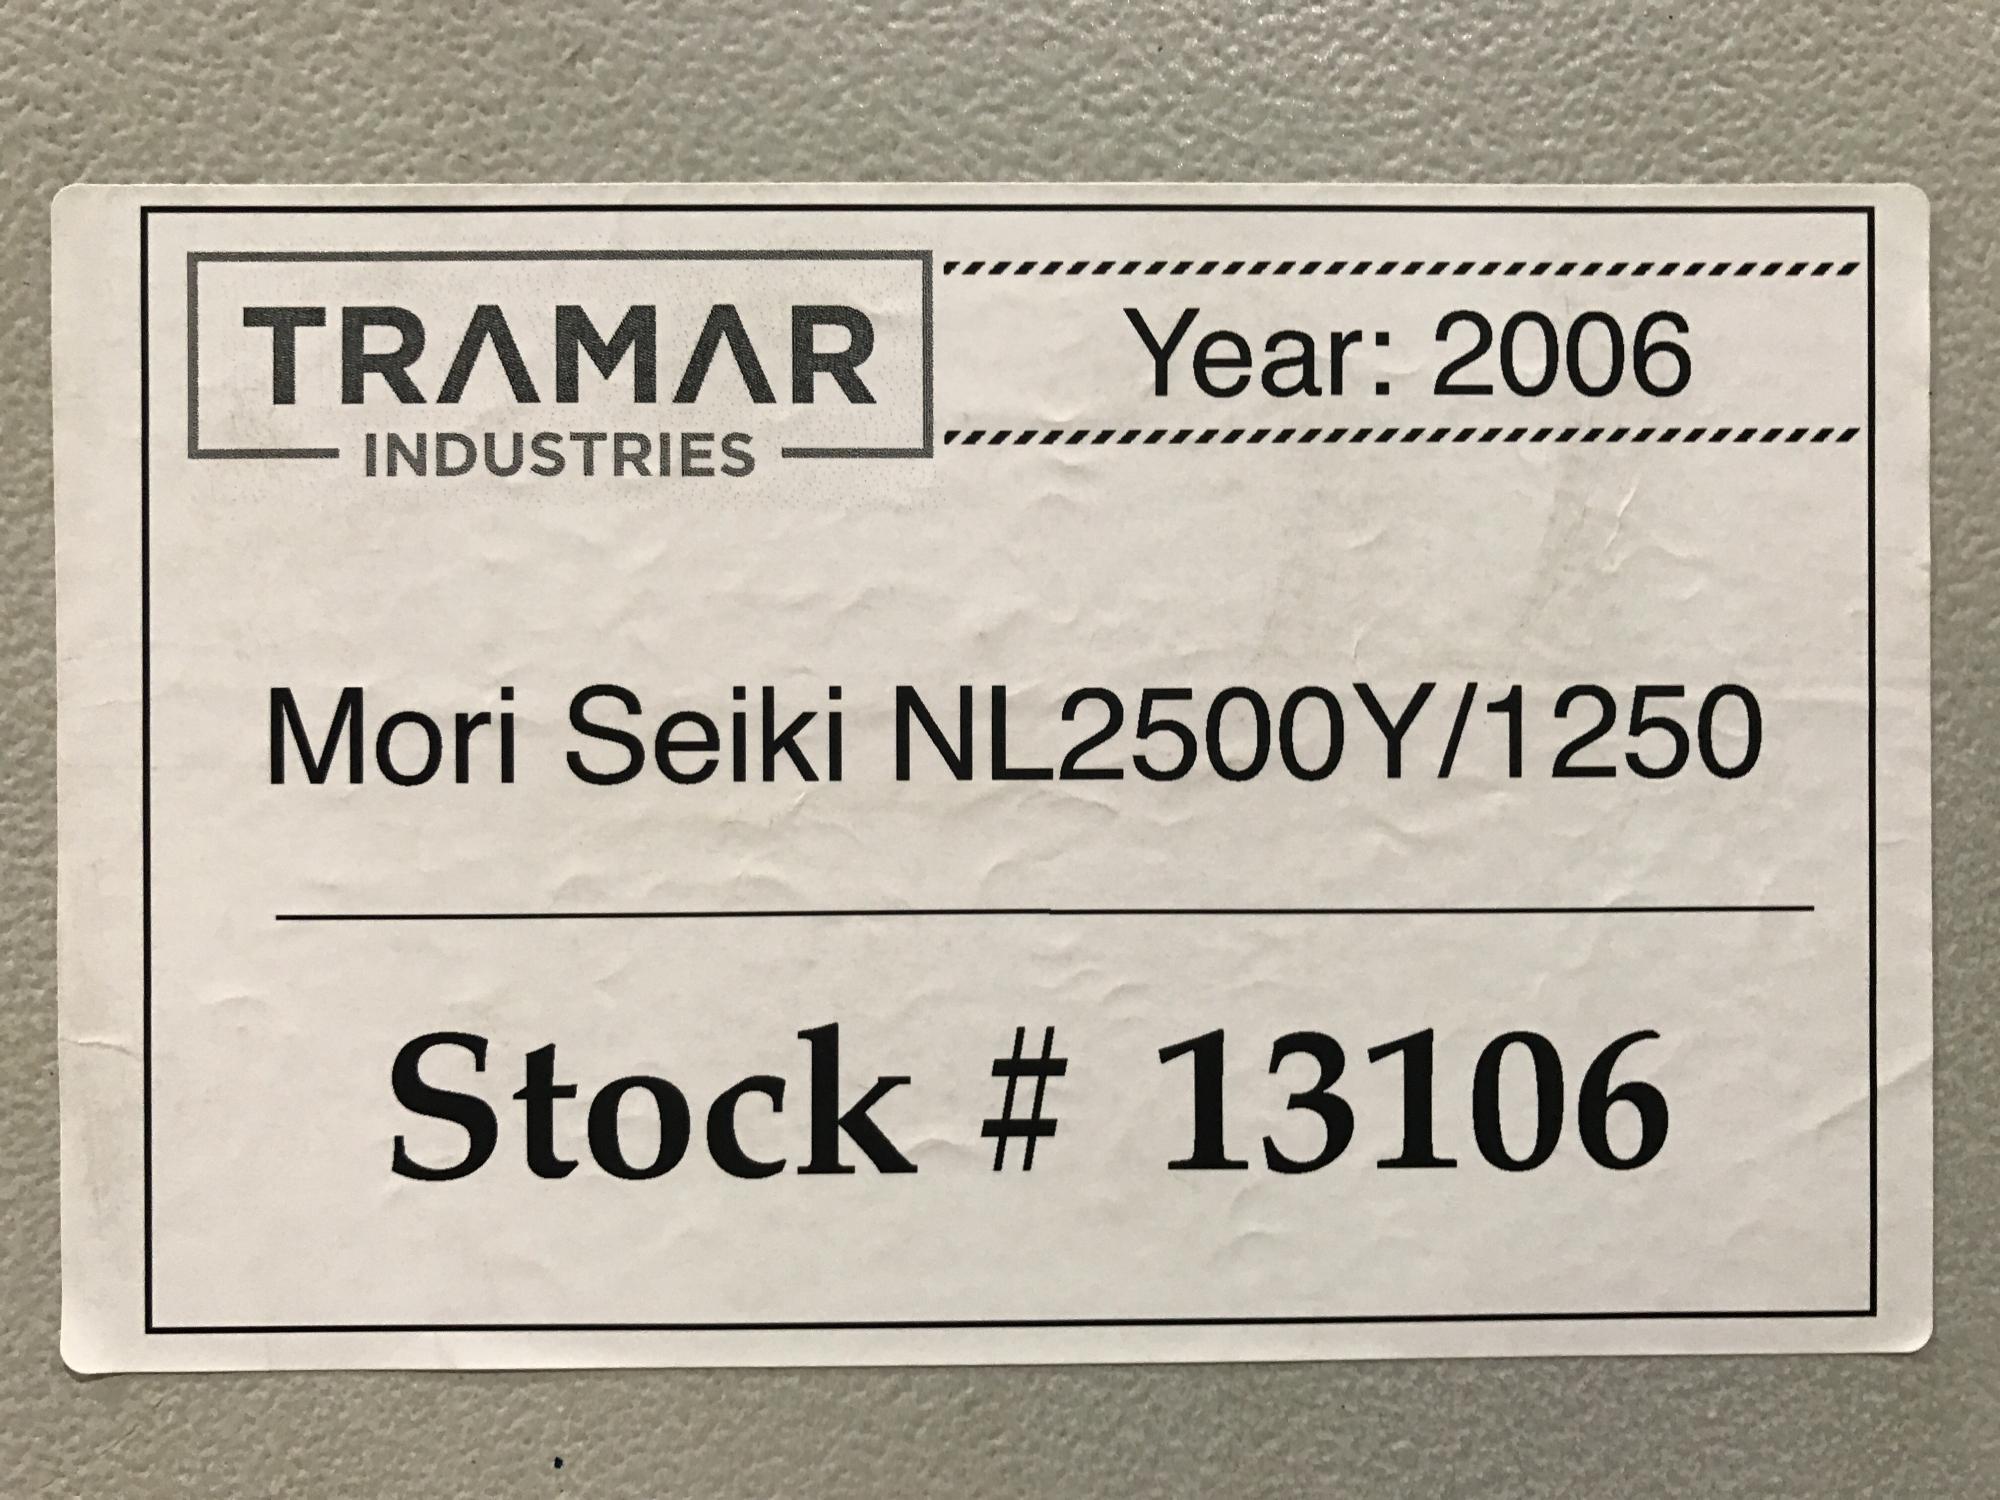 2006 MORI SEIKI NL2500Y/1250 - CNC Horizontal Lathe